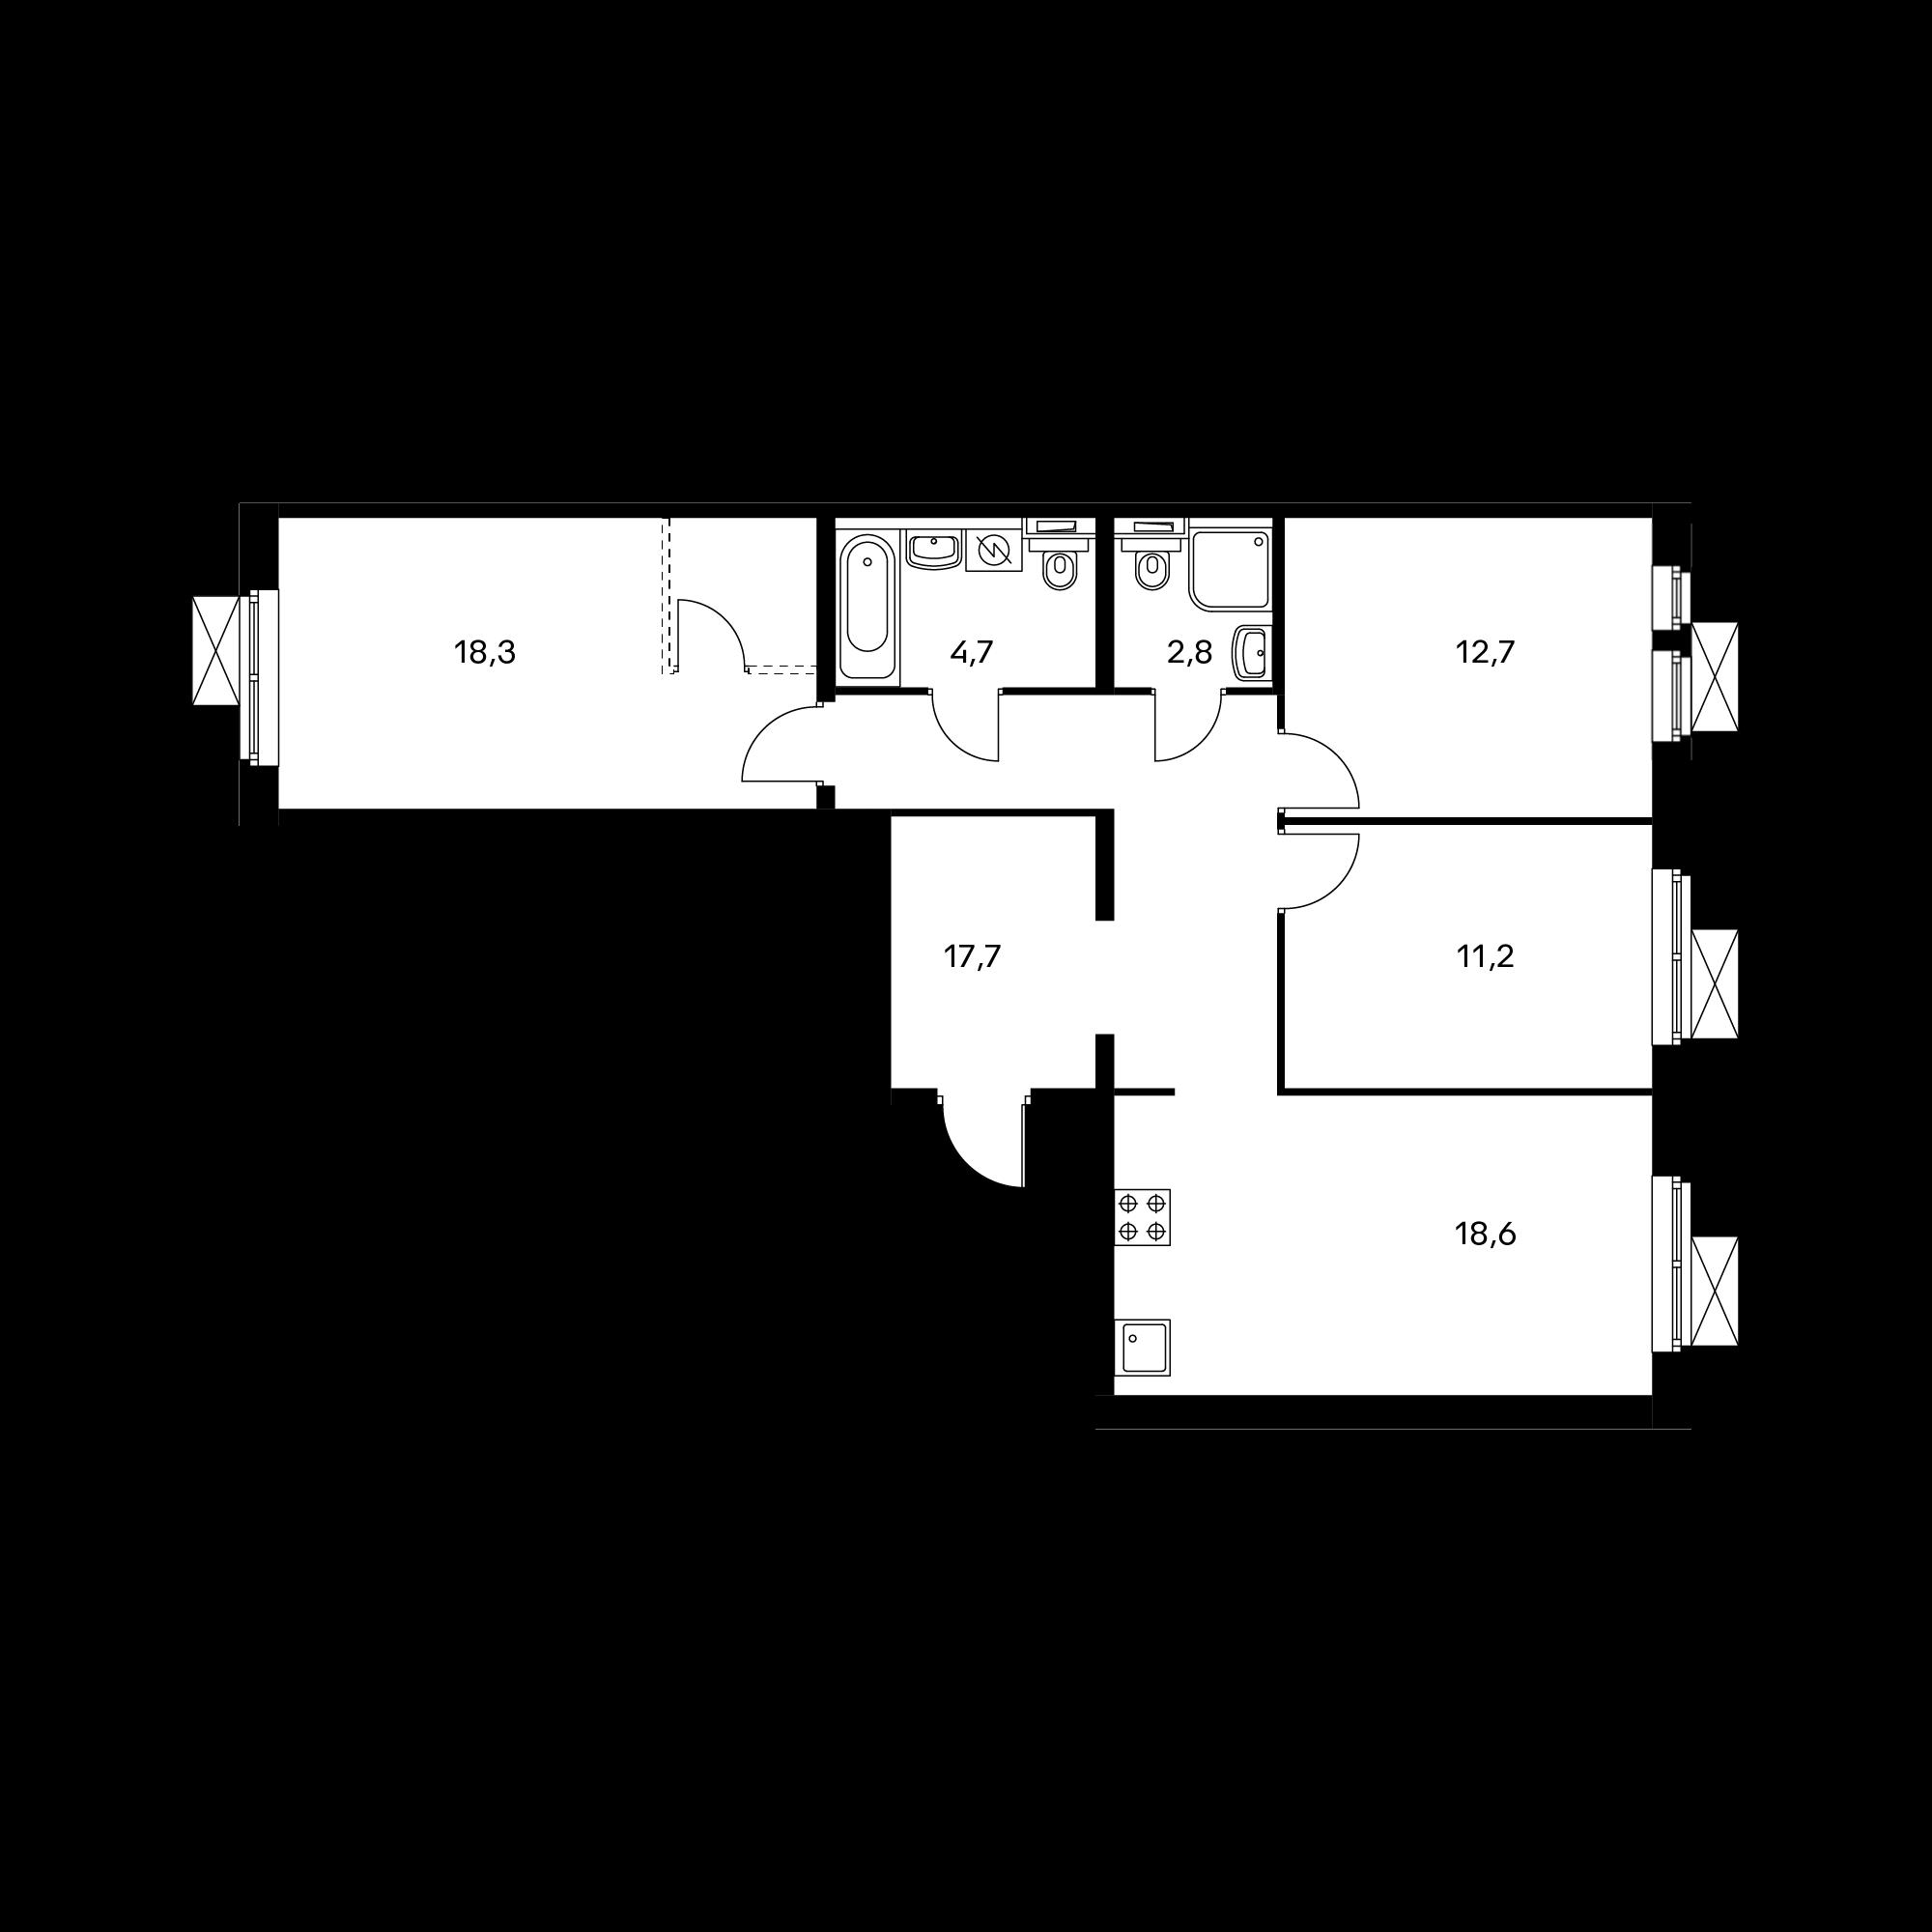 3EL3_9.6-5